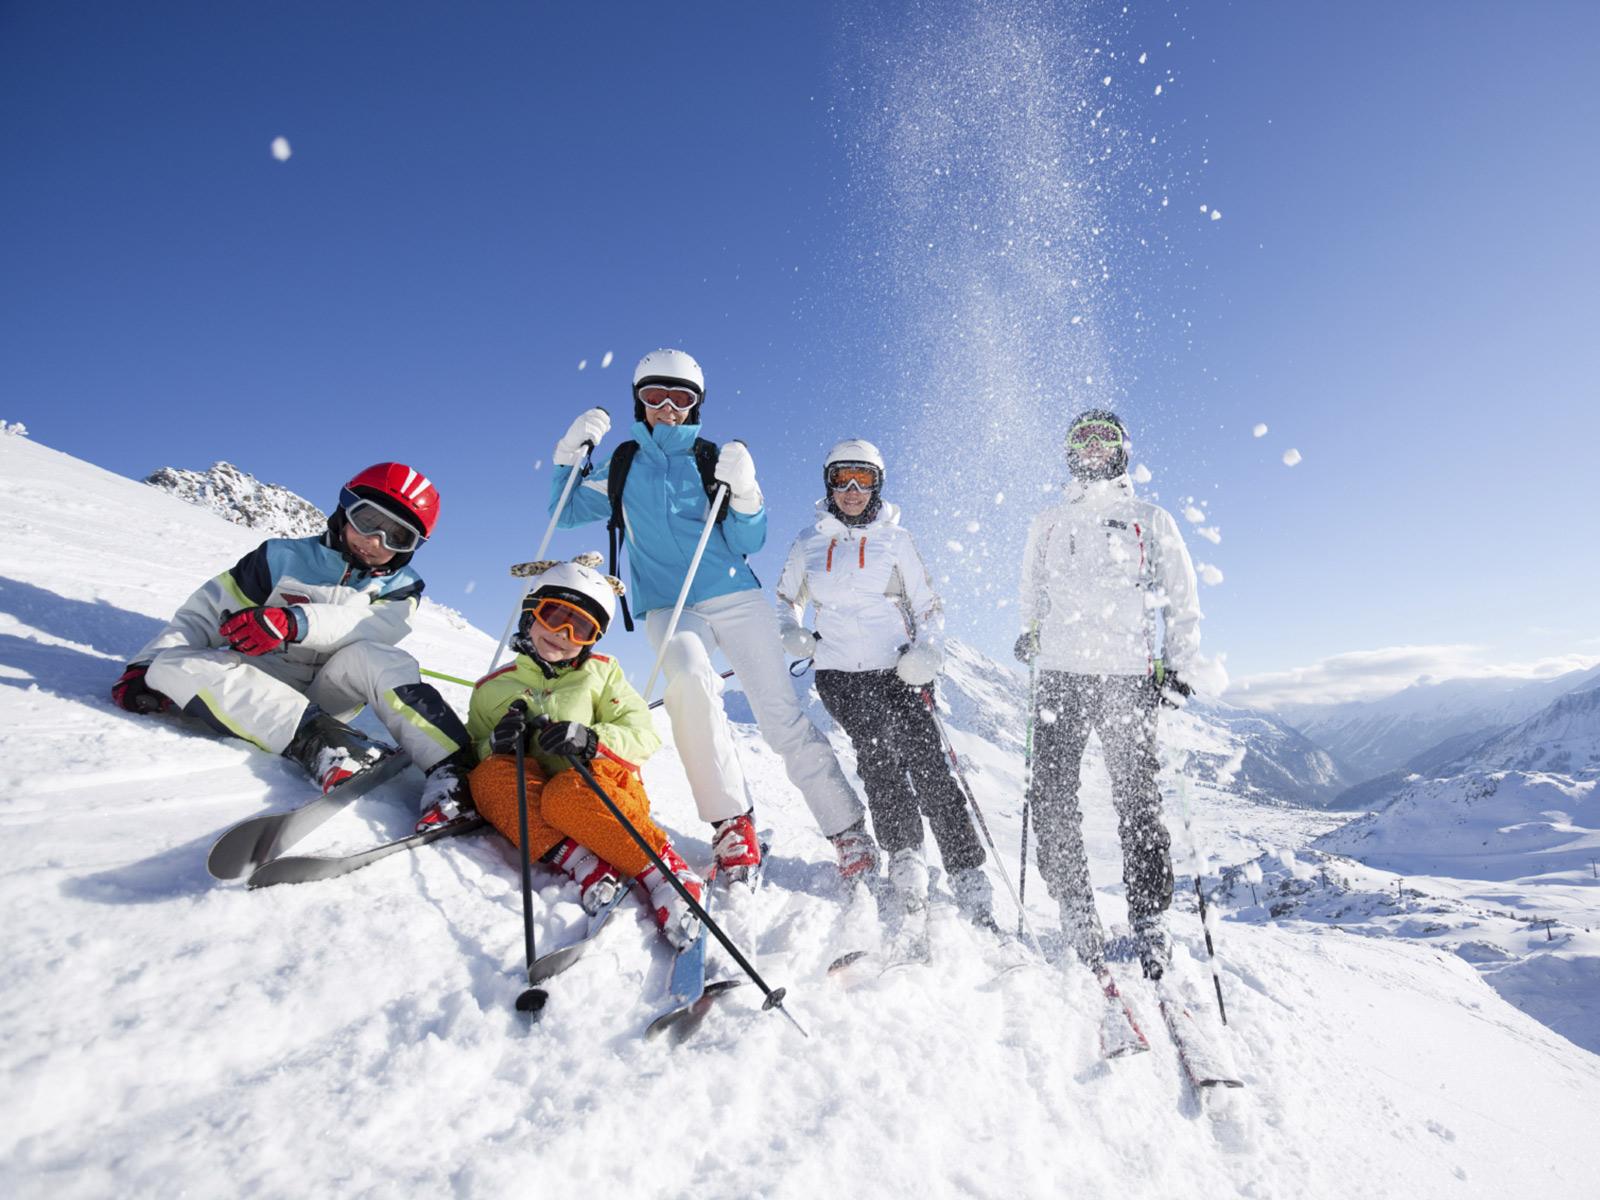 Camping Ski Pratiquez Les Sports D Hiver Avec Yelloh Village